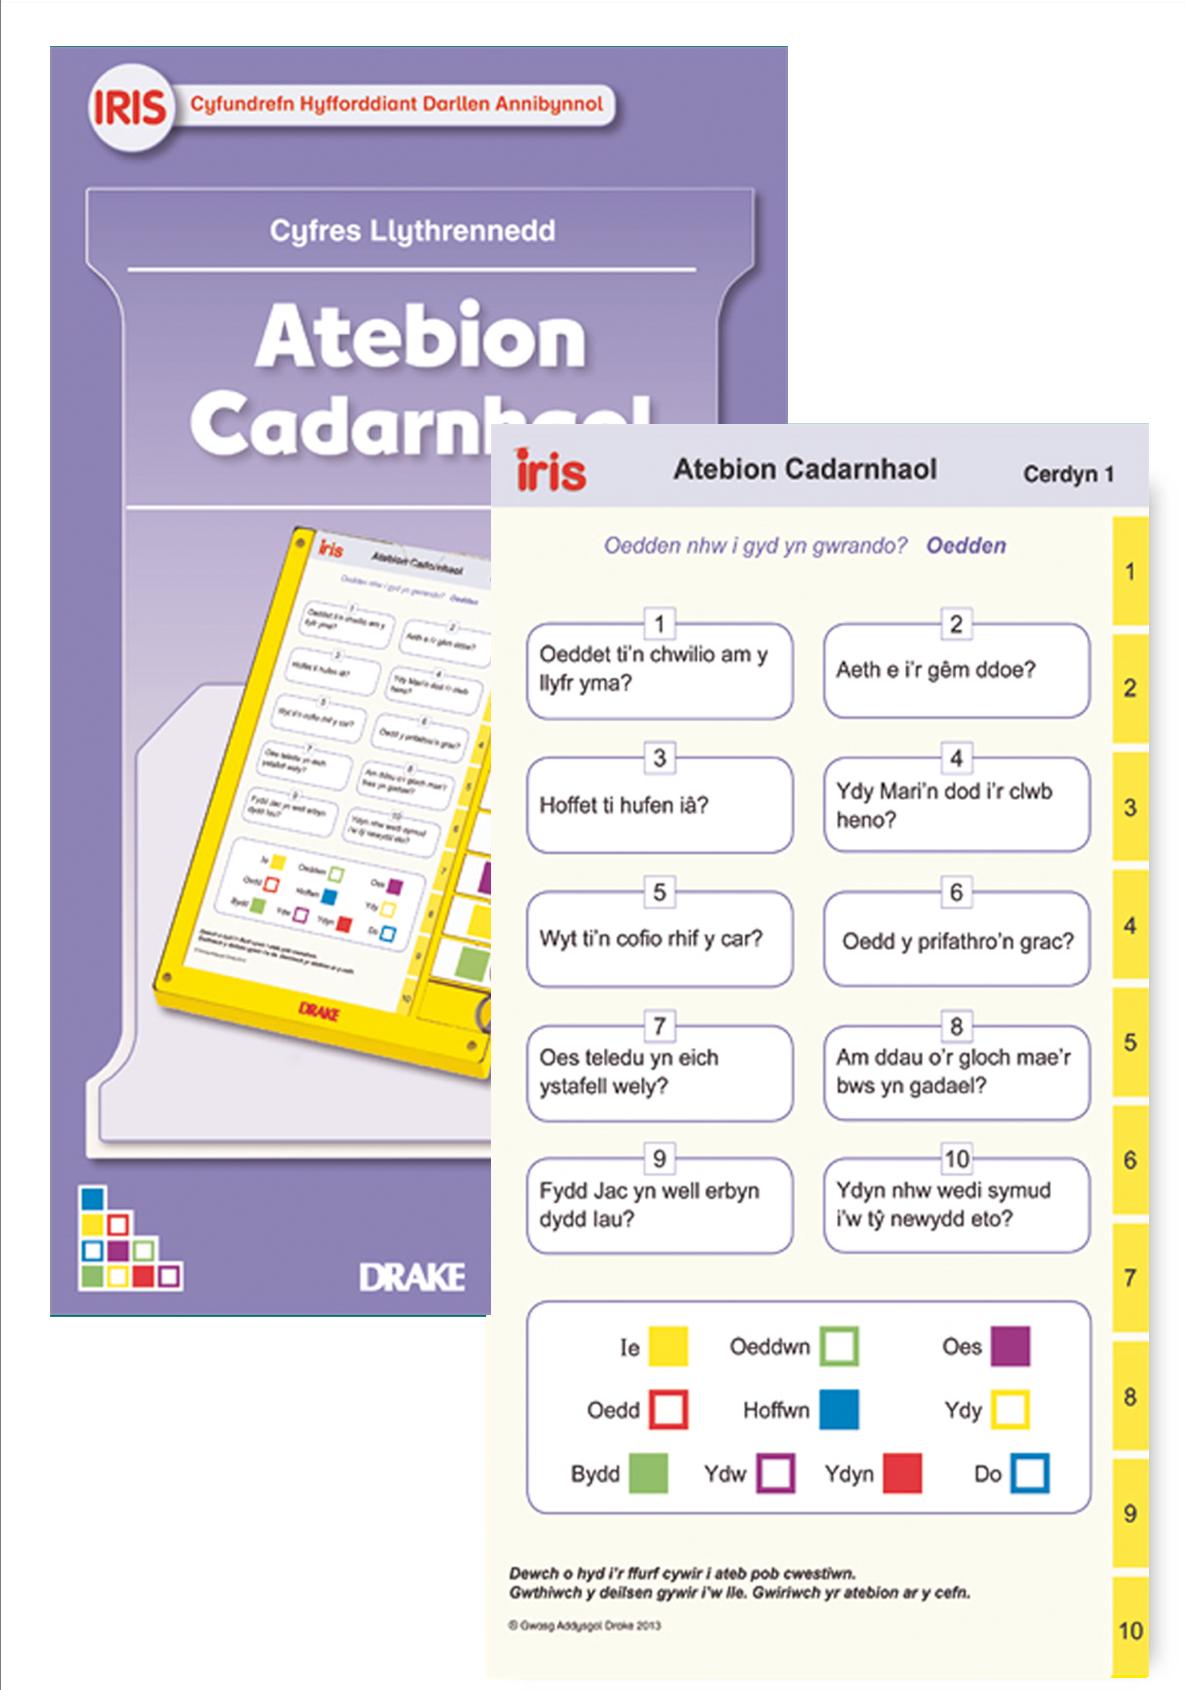 Atebion Cadarnhaol